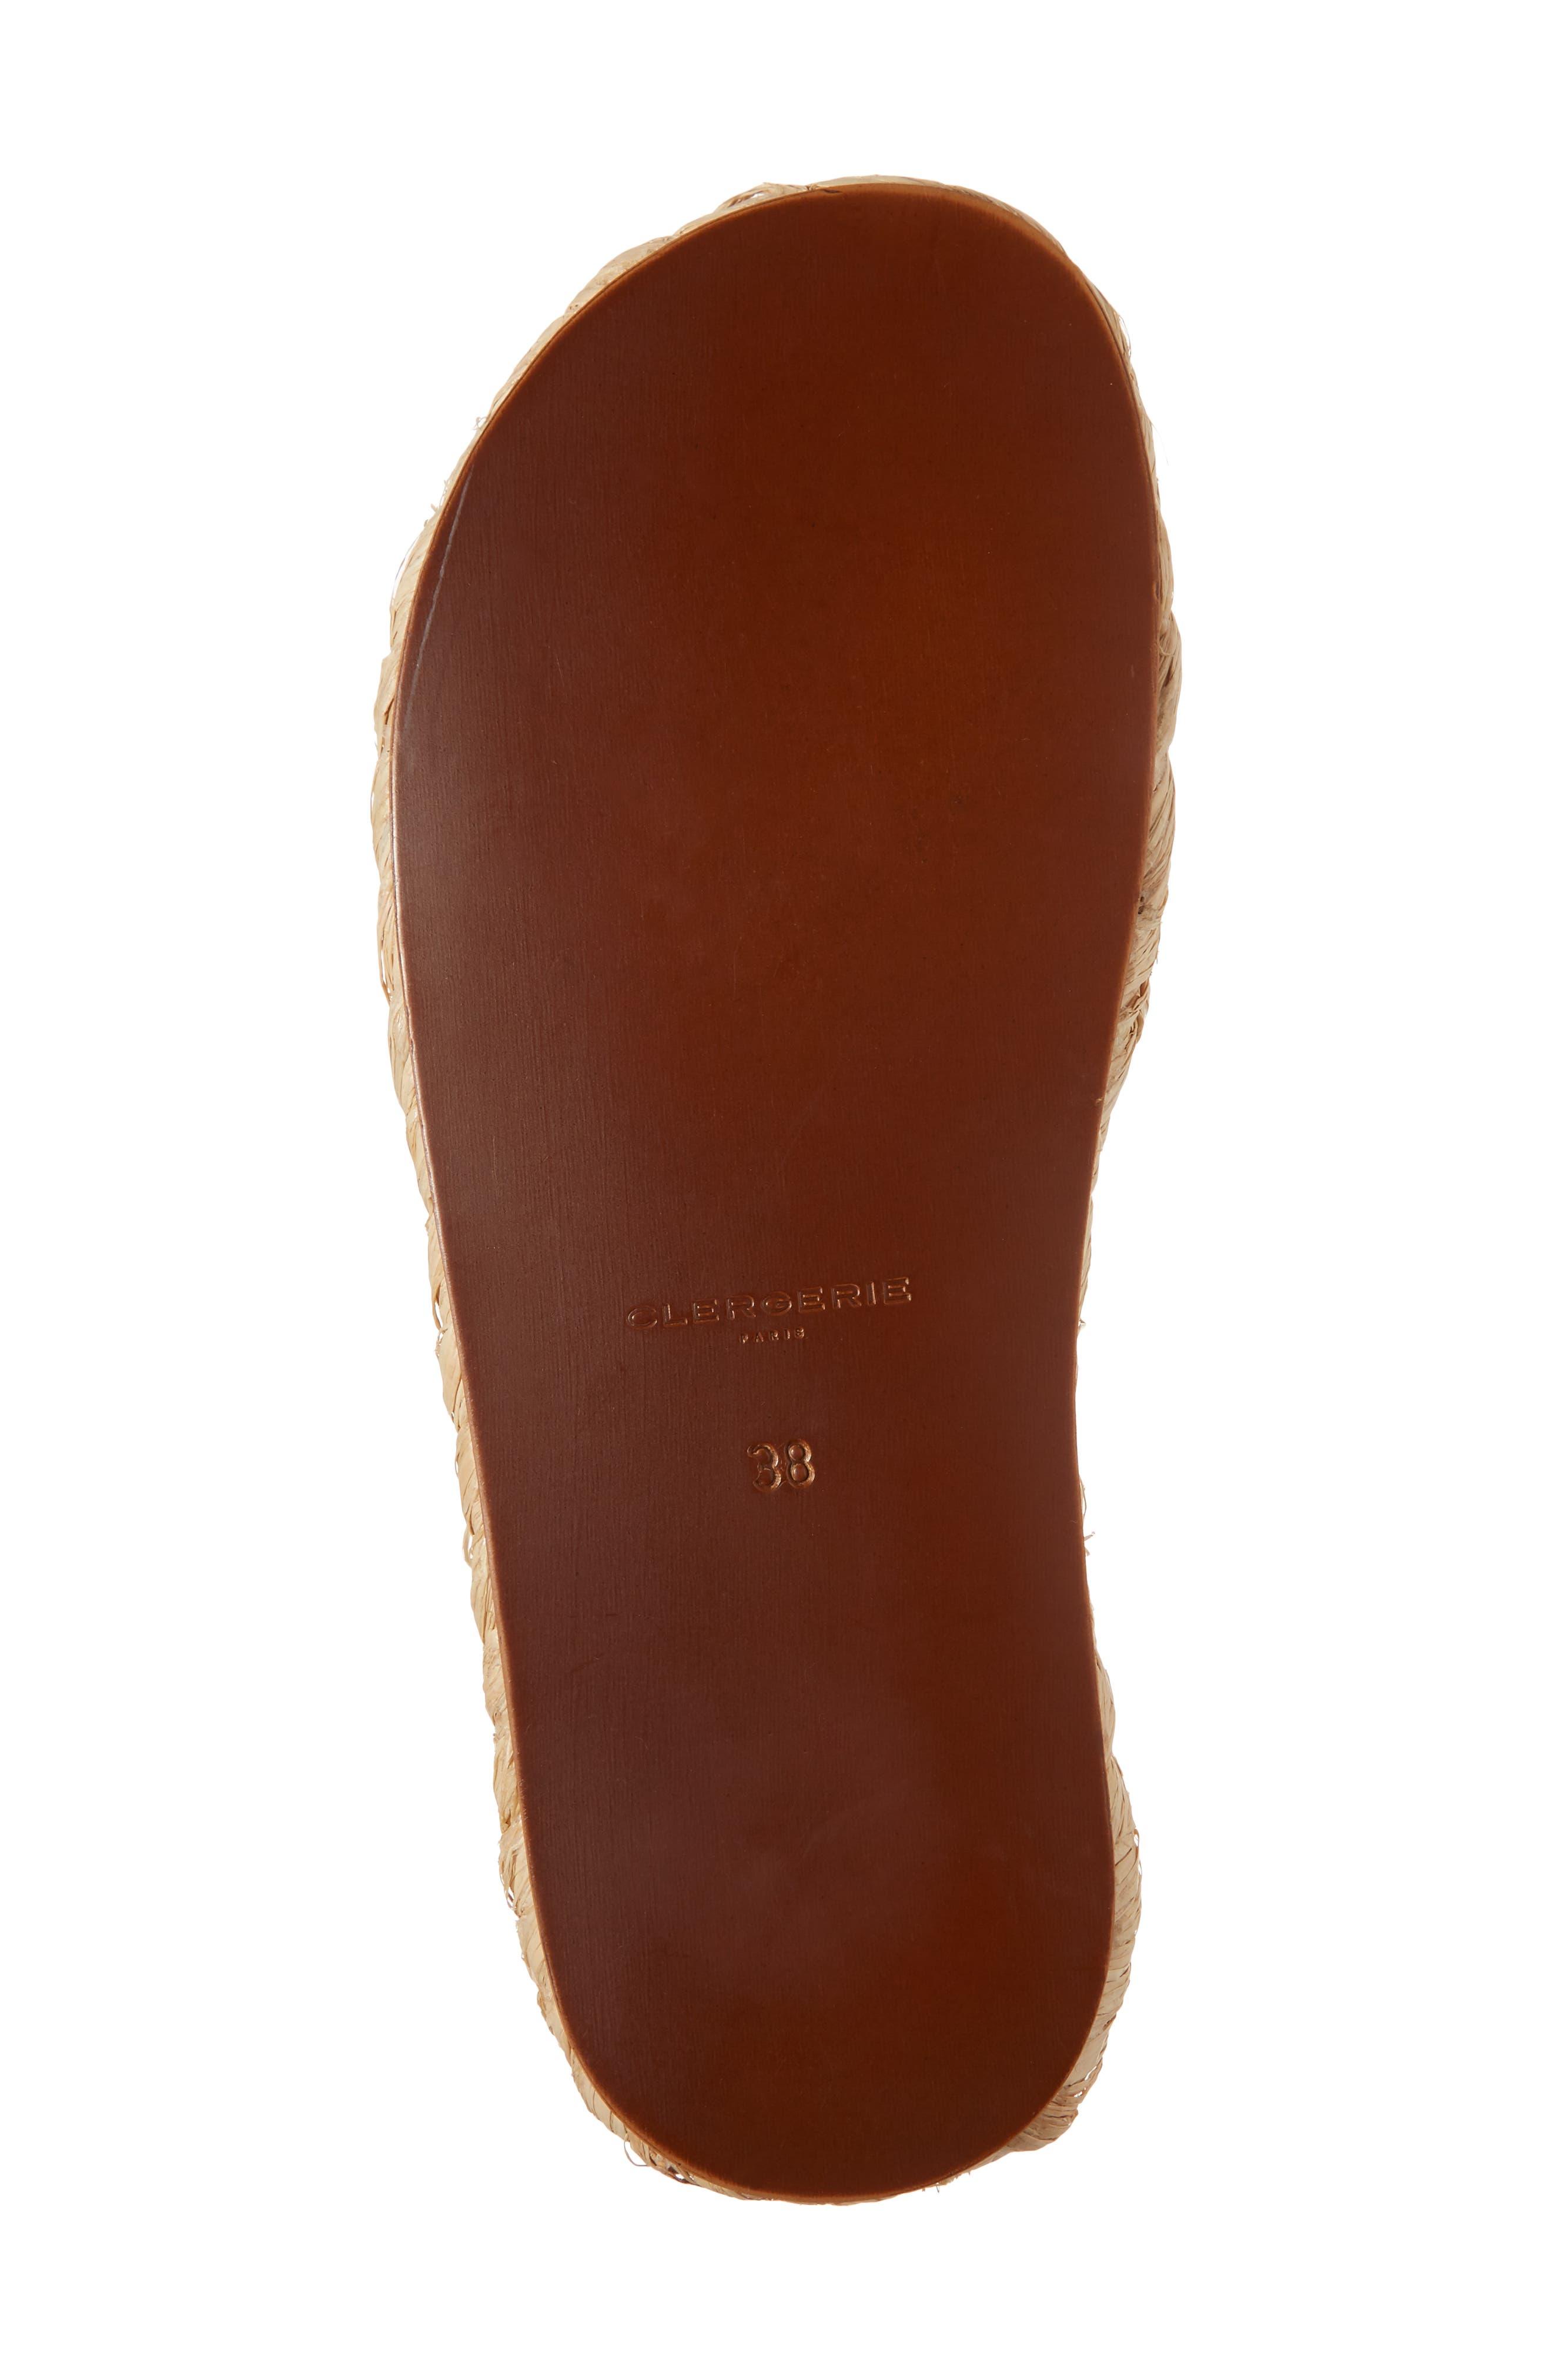 Idalie Woven Slide Sandal,                             Alternate thumbnail 6, color,                             Tan